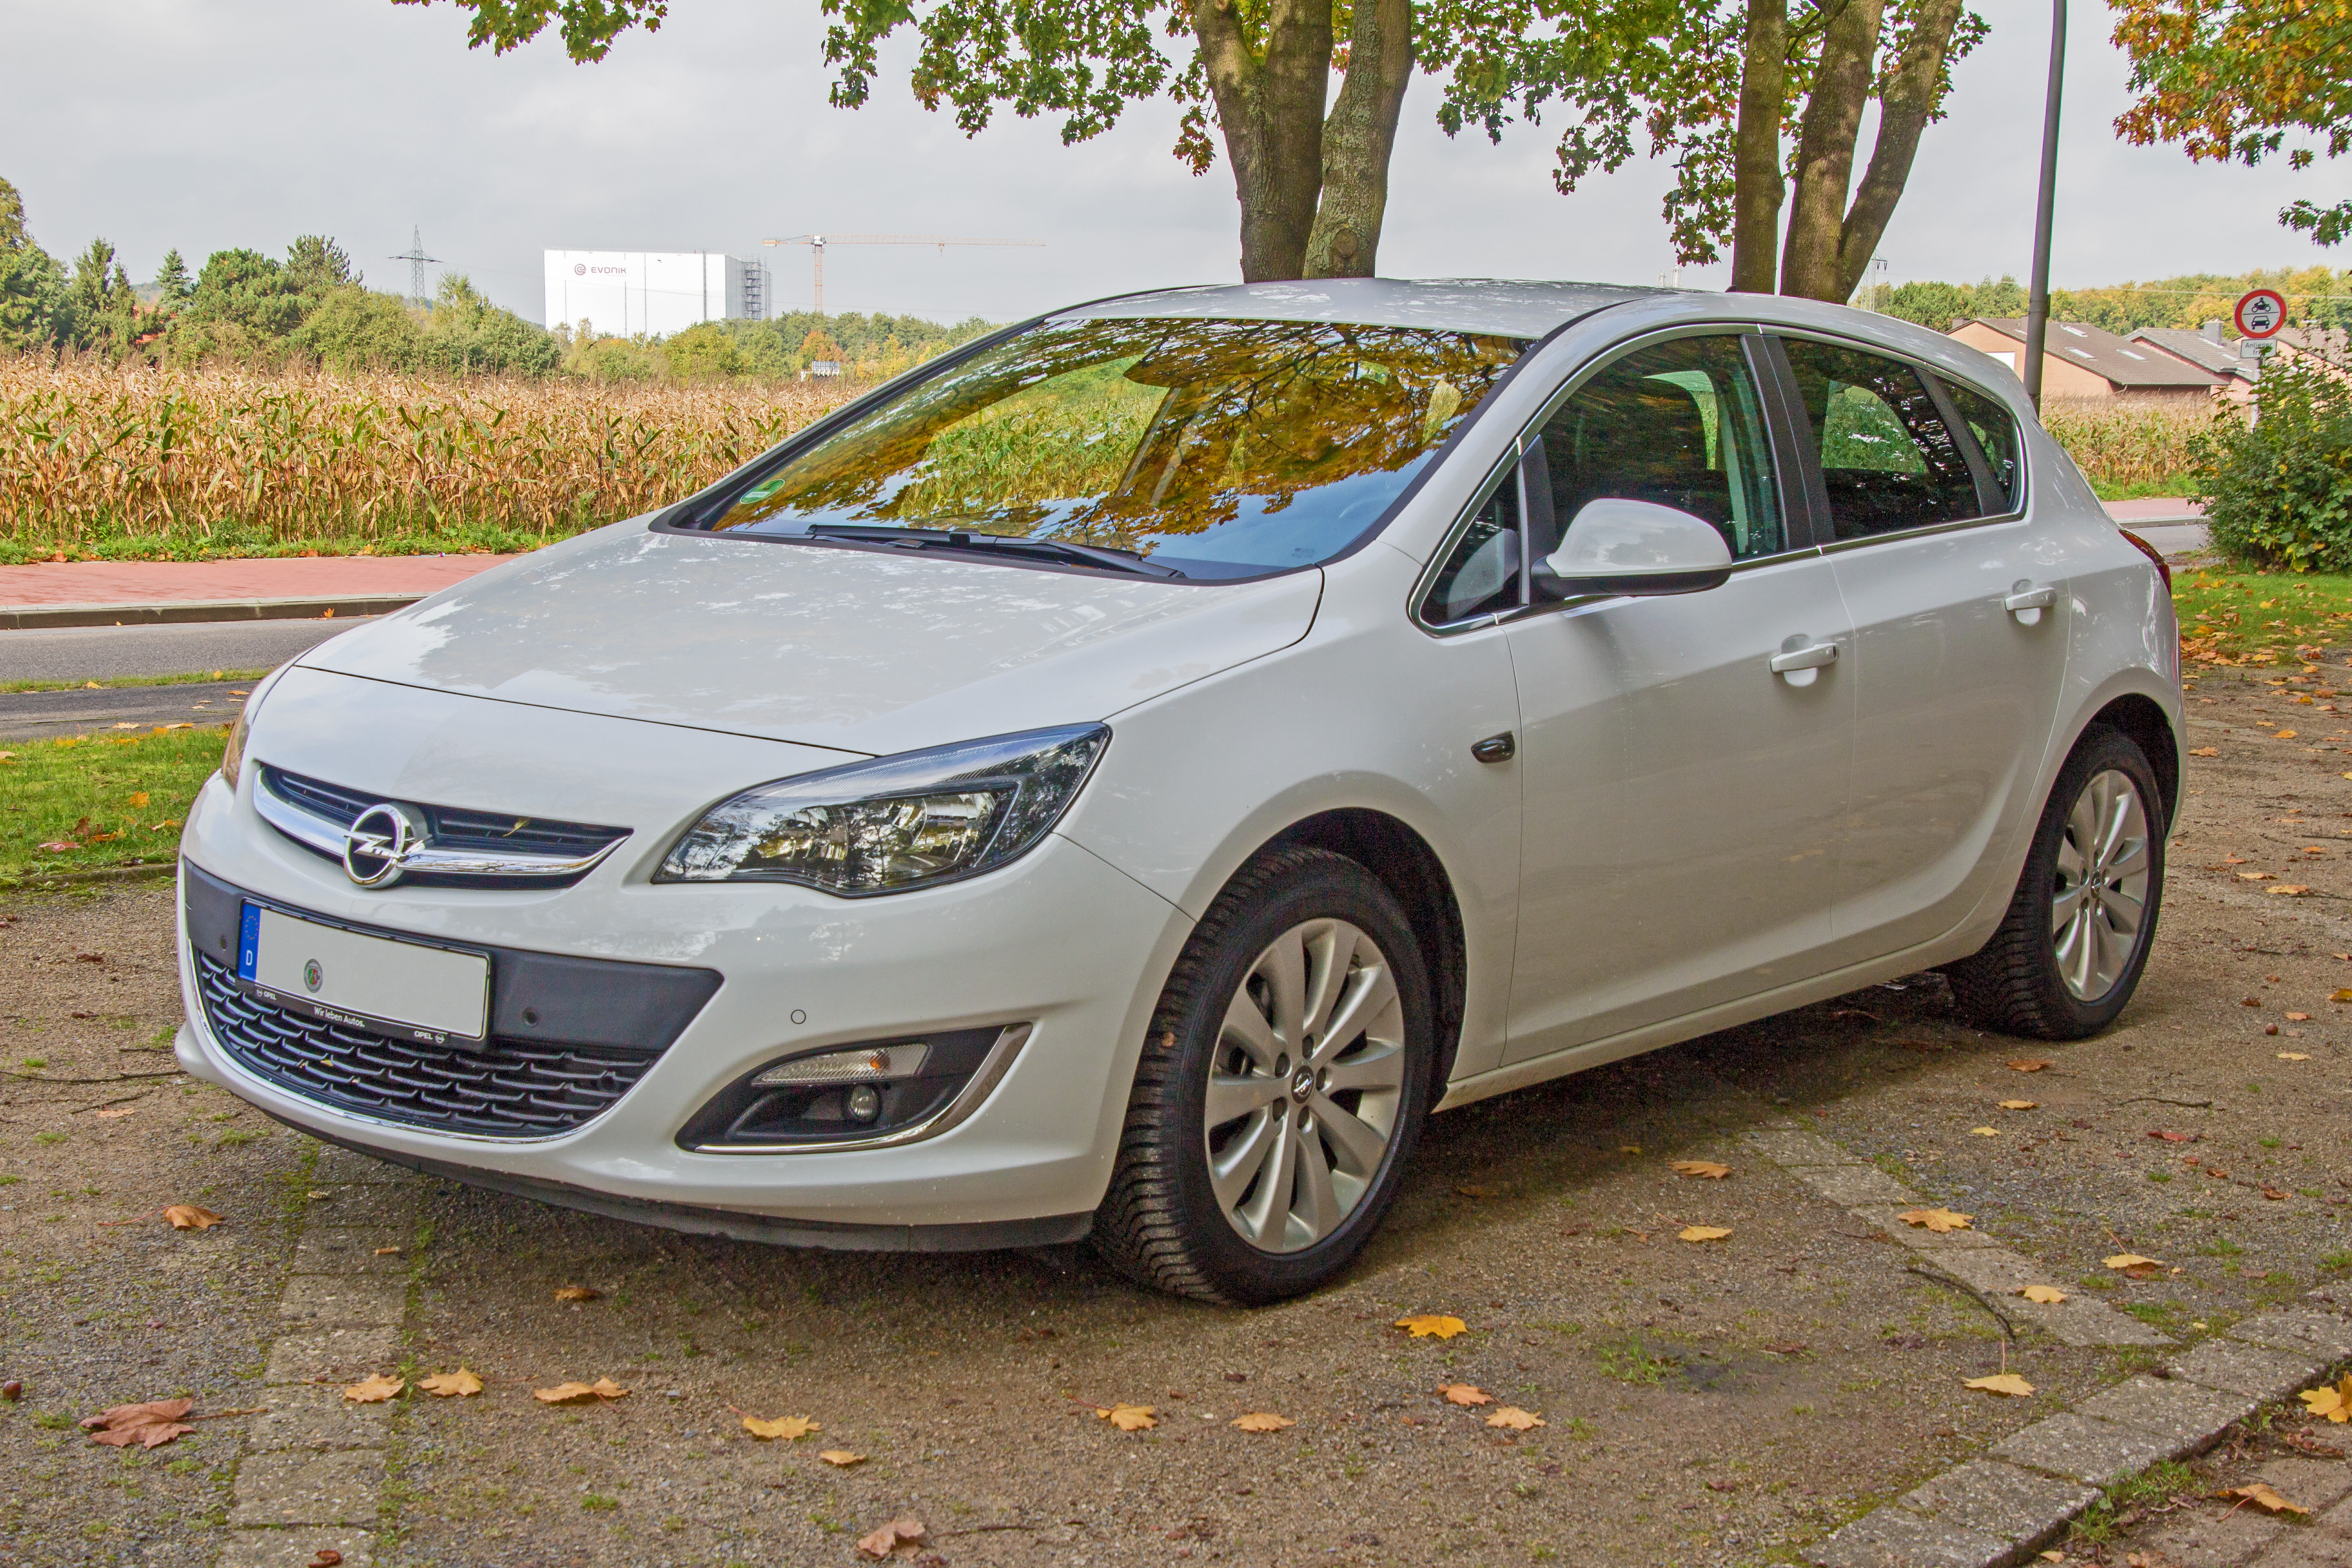 File Opel Astra J Modellpflege Front Jpg Wikimedia Commons